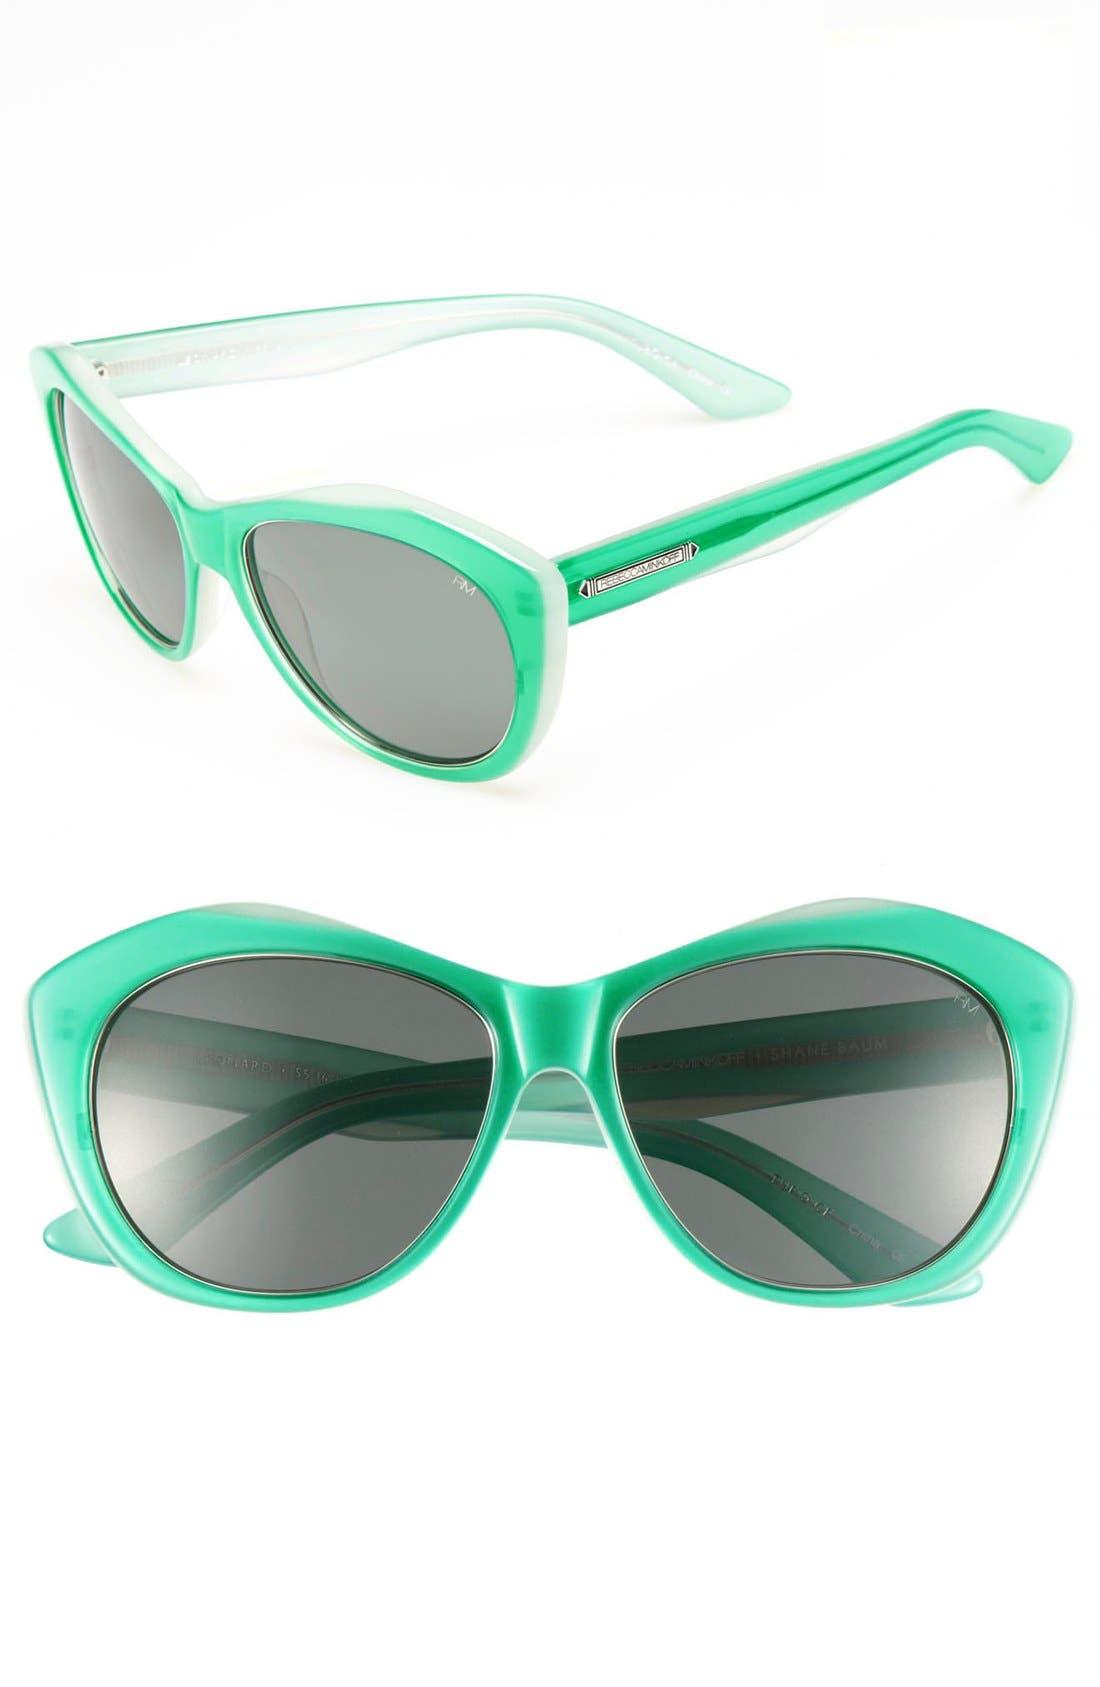 Alternate Image 1 Selected - Rebecca Minkoff 'Leonard' Sunglasses